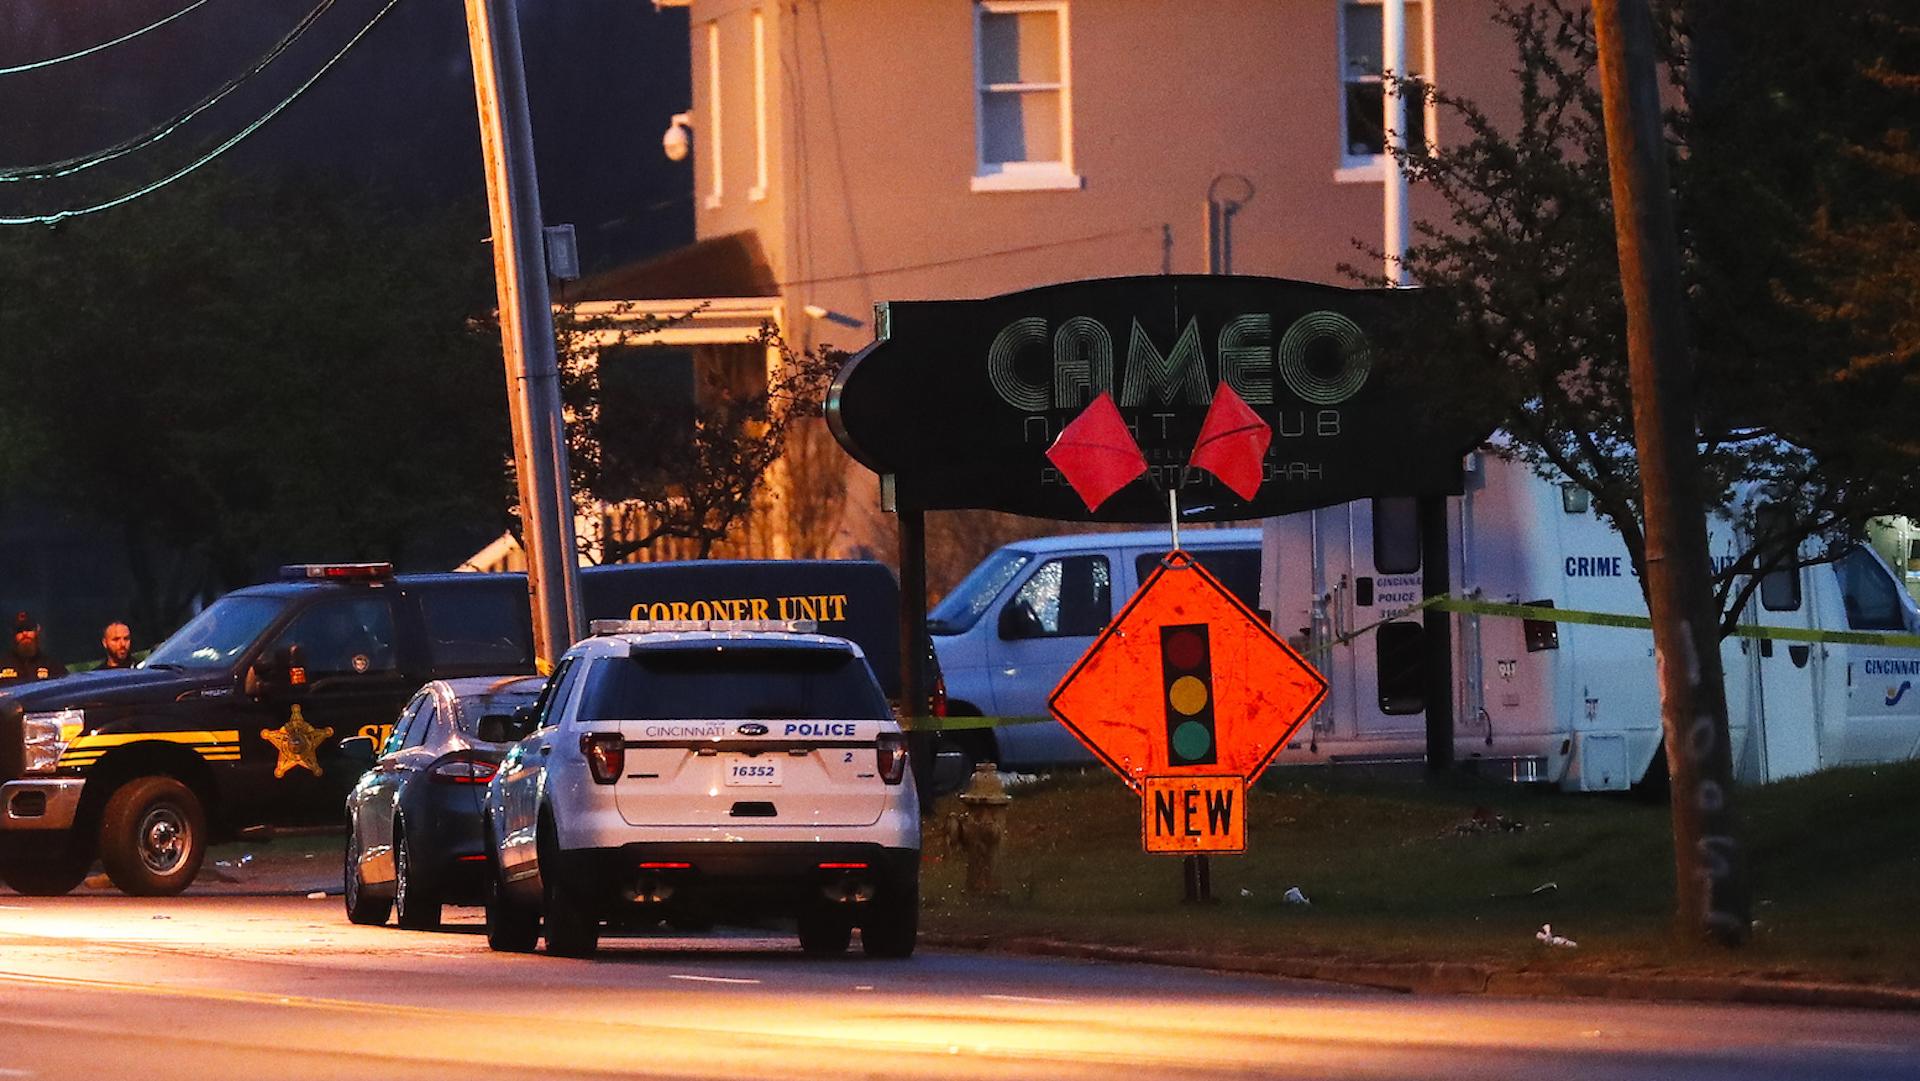 Gunmen fire inside Cincinnati nightclub, killing 1 and injuring 15, police say